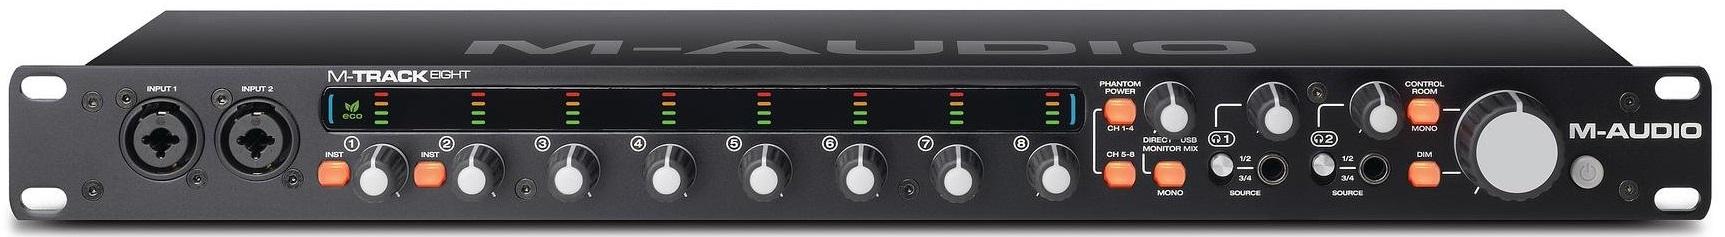 Звуковая карта M-Audio M-Track Eight